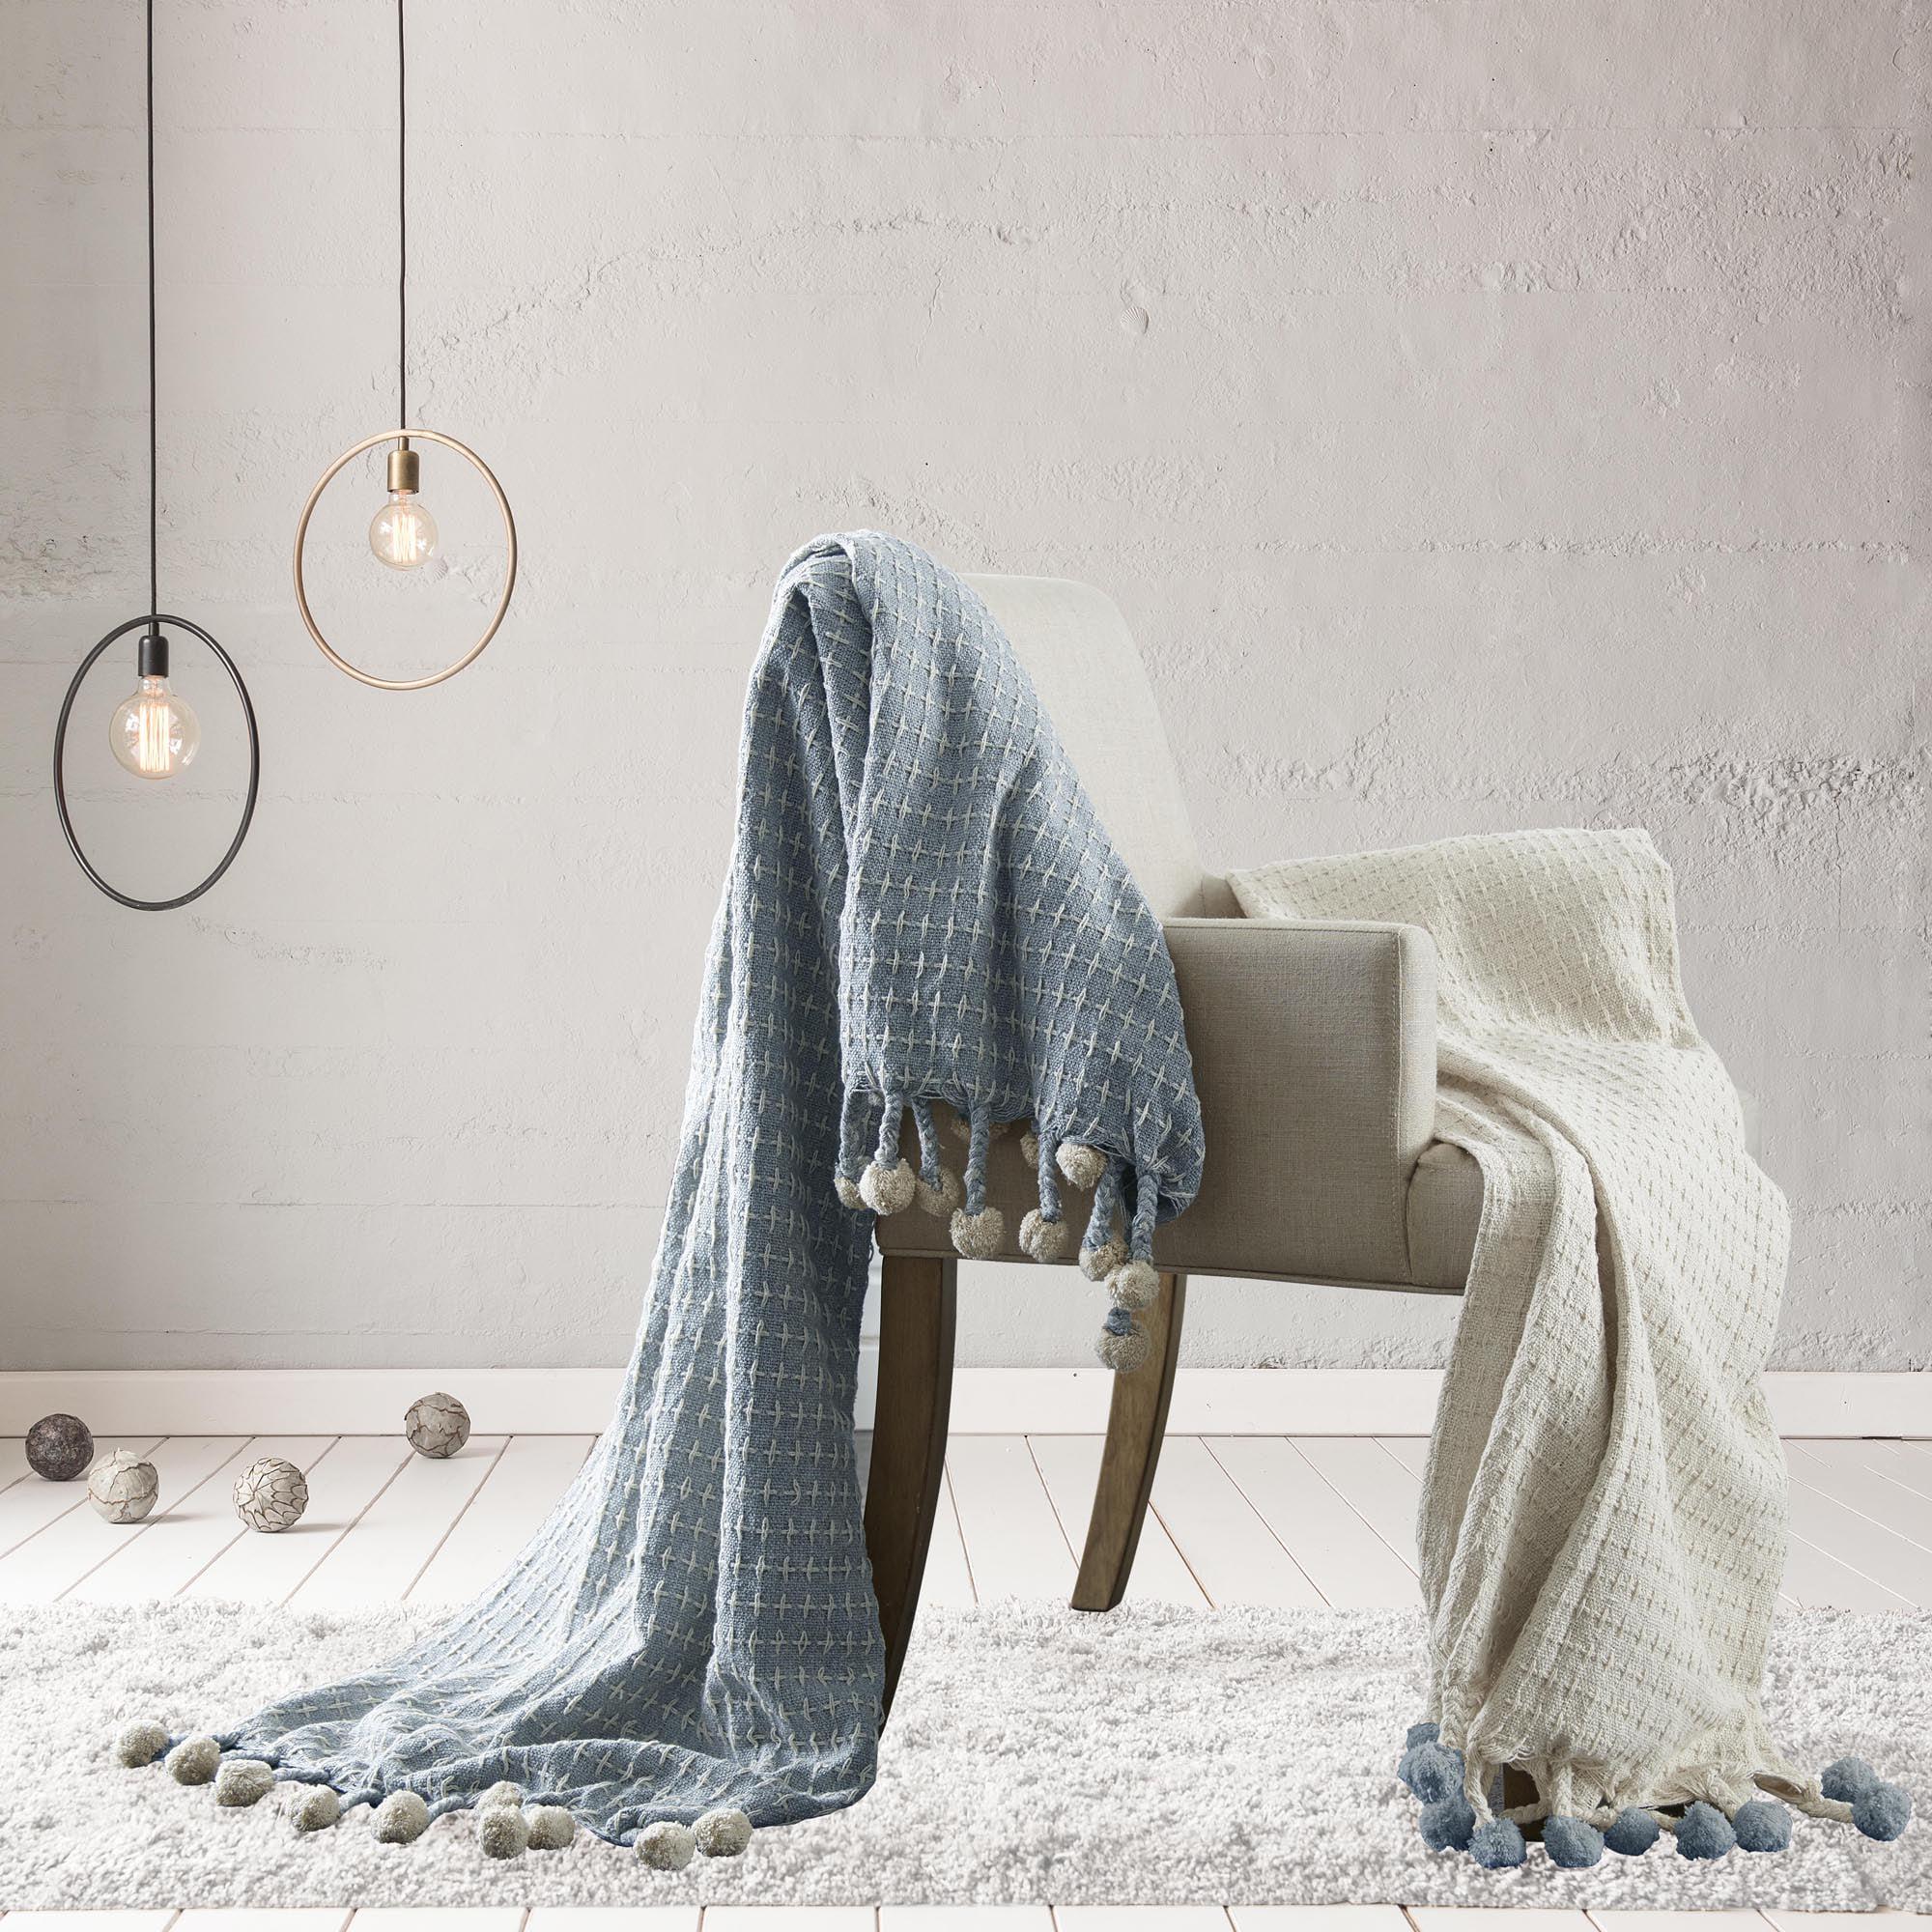 Pacific Coast Textiles Diamond Maze Throw Blanket with Pom Pom Ends, 2 Pack